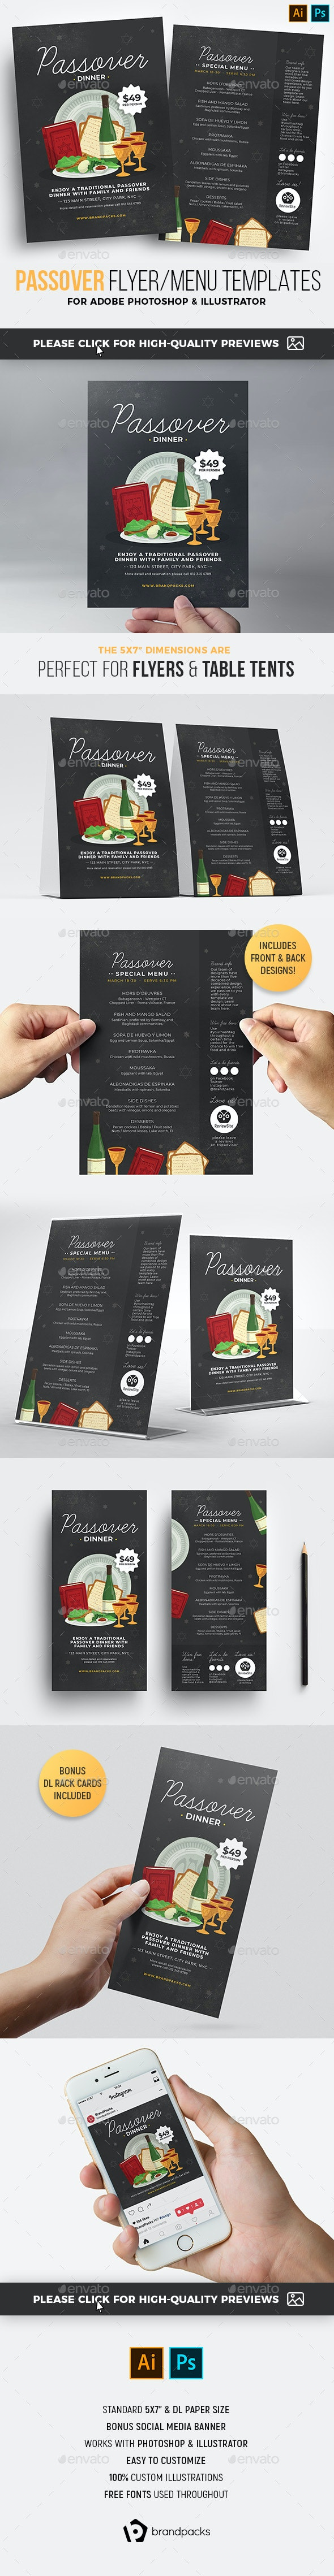 Passover Flyer / Menu Templates - Holidays Events